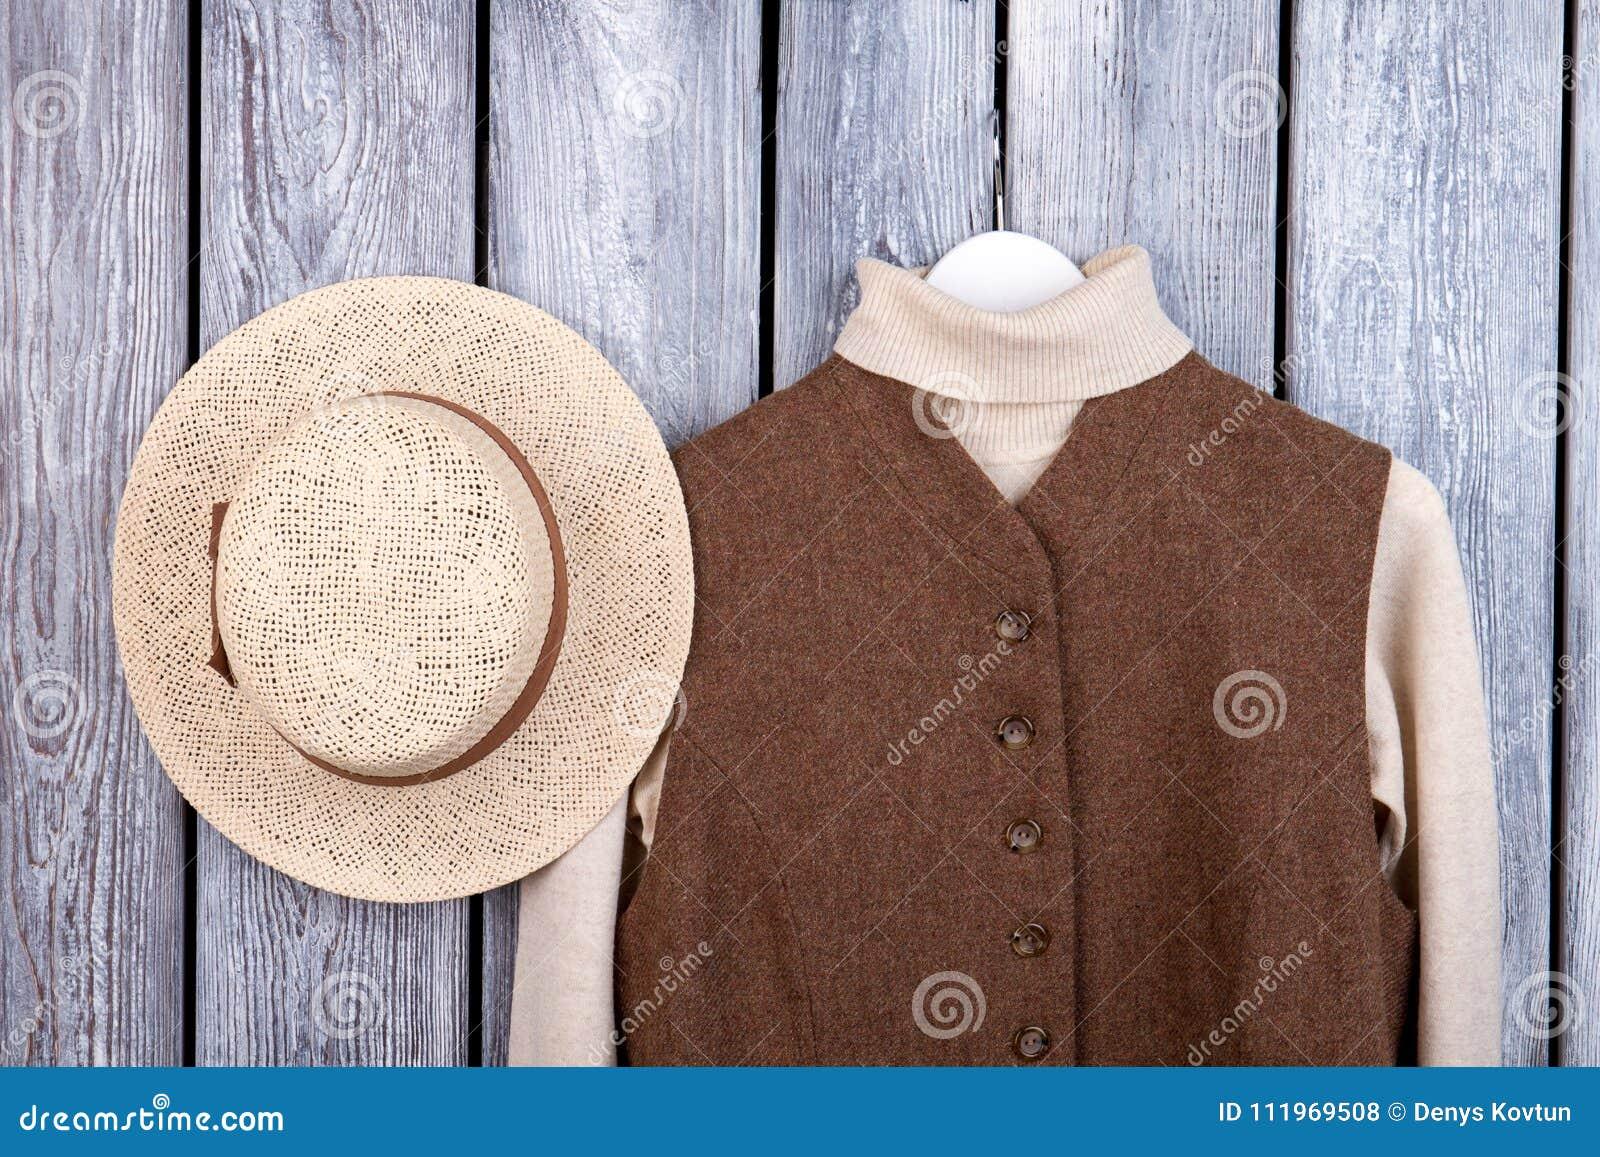 Straw Brim Hat And Wool Sweater In Sleeveless Jacket. Stock Photo ... cb474b2958e9